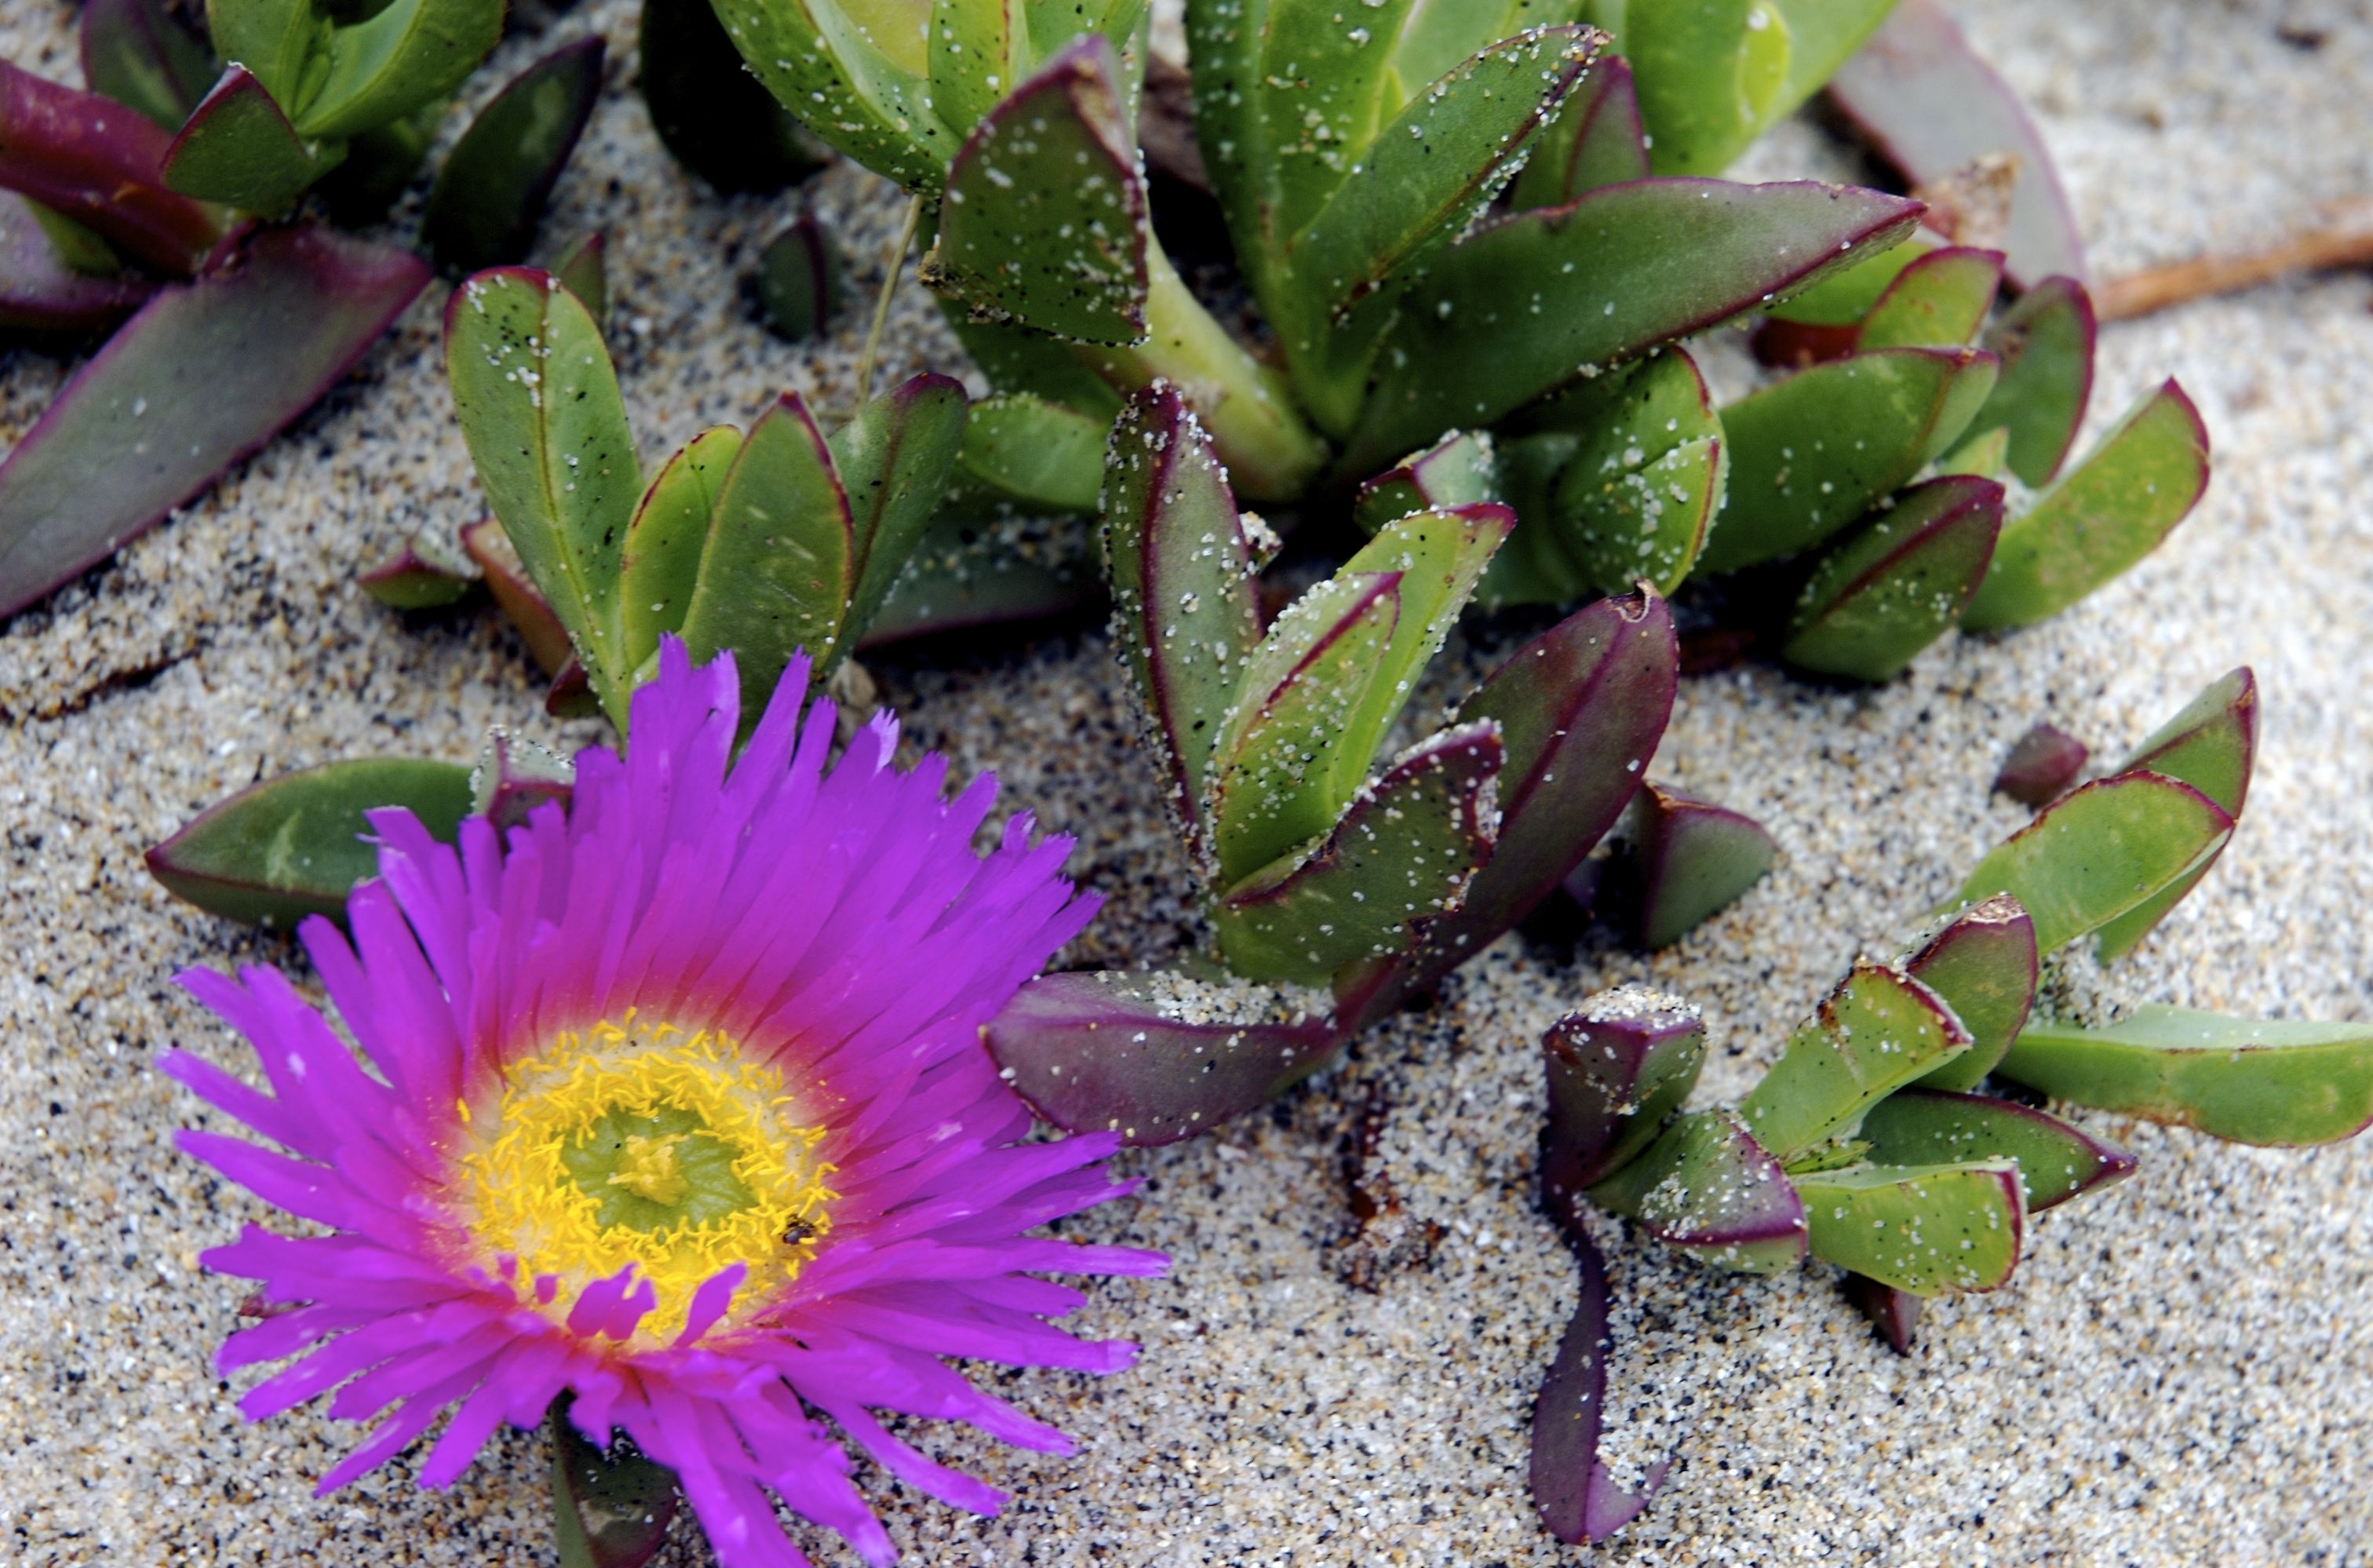 weskus vygie in California ) Plants, Cacti, succulents